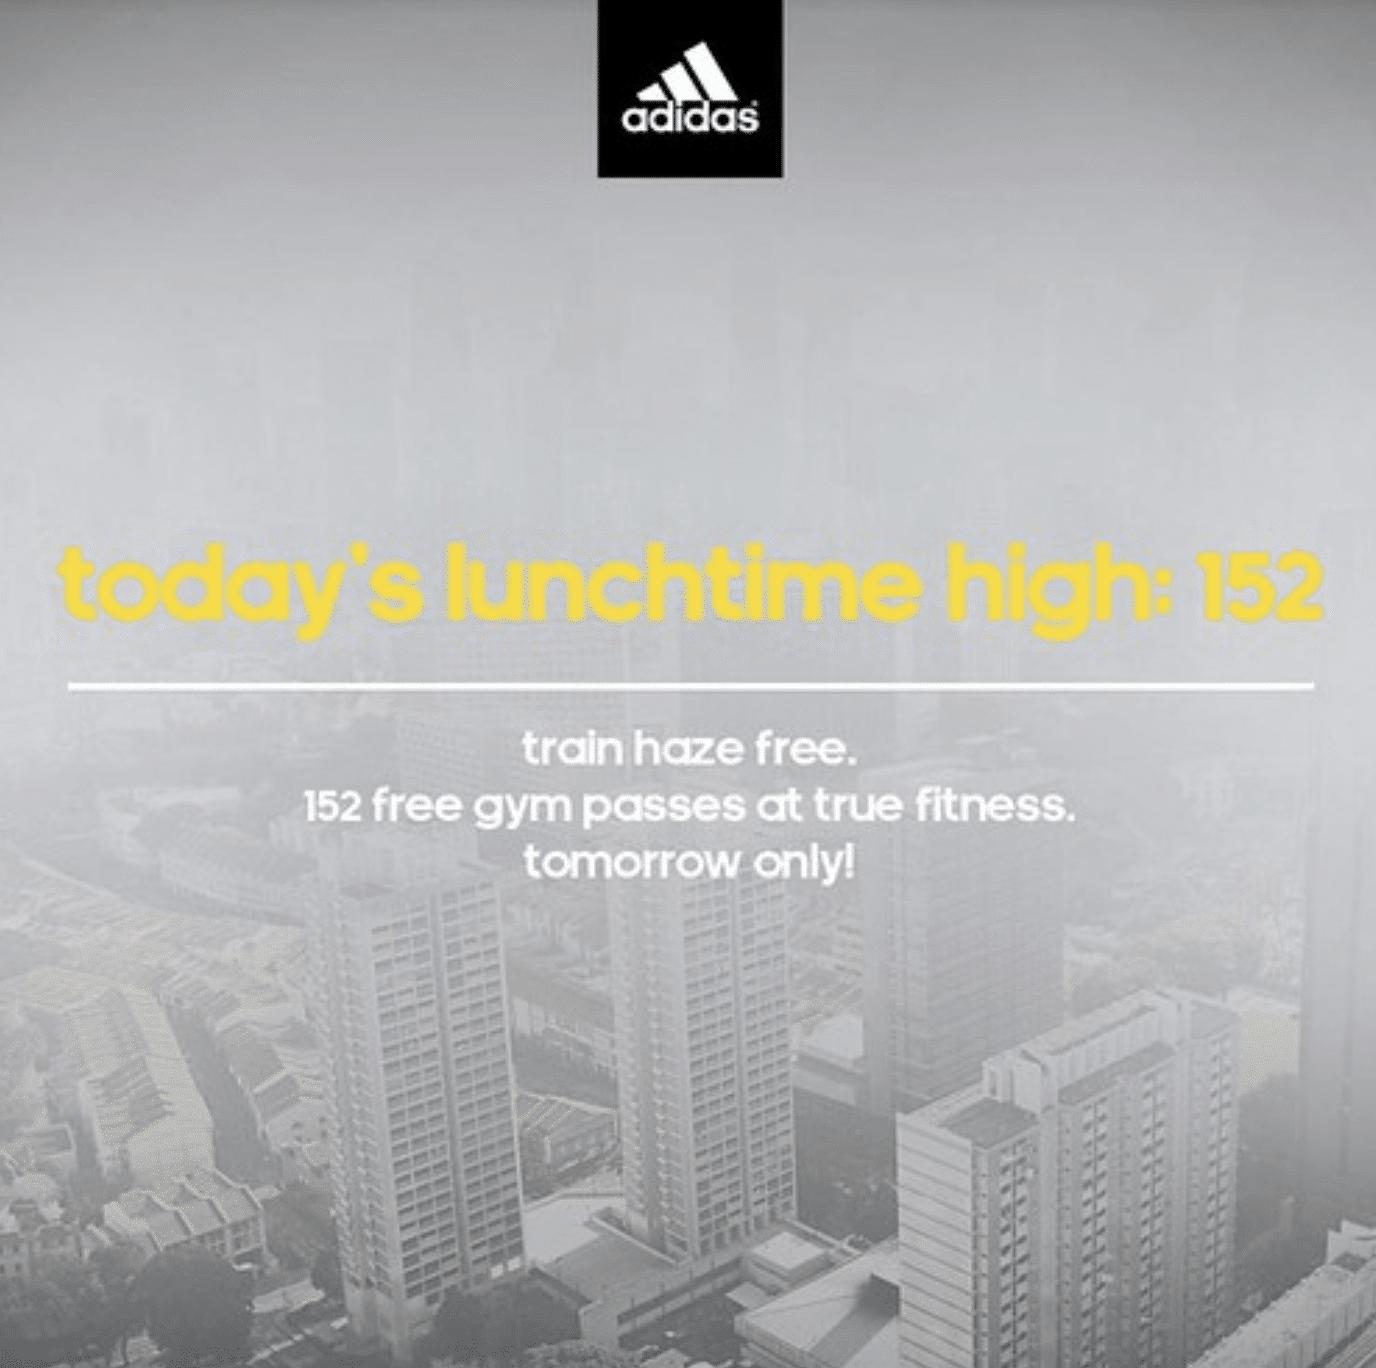 Nike train haze free gym pass at true fitness